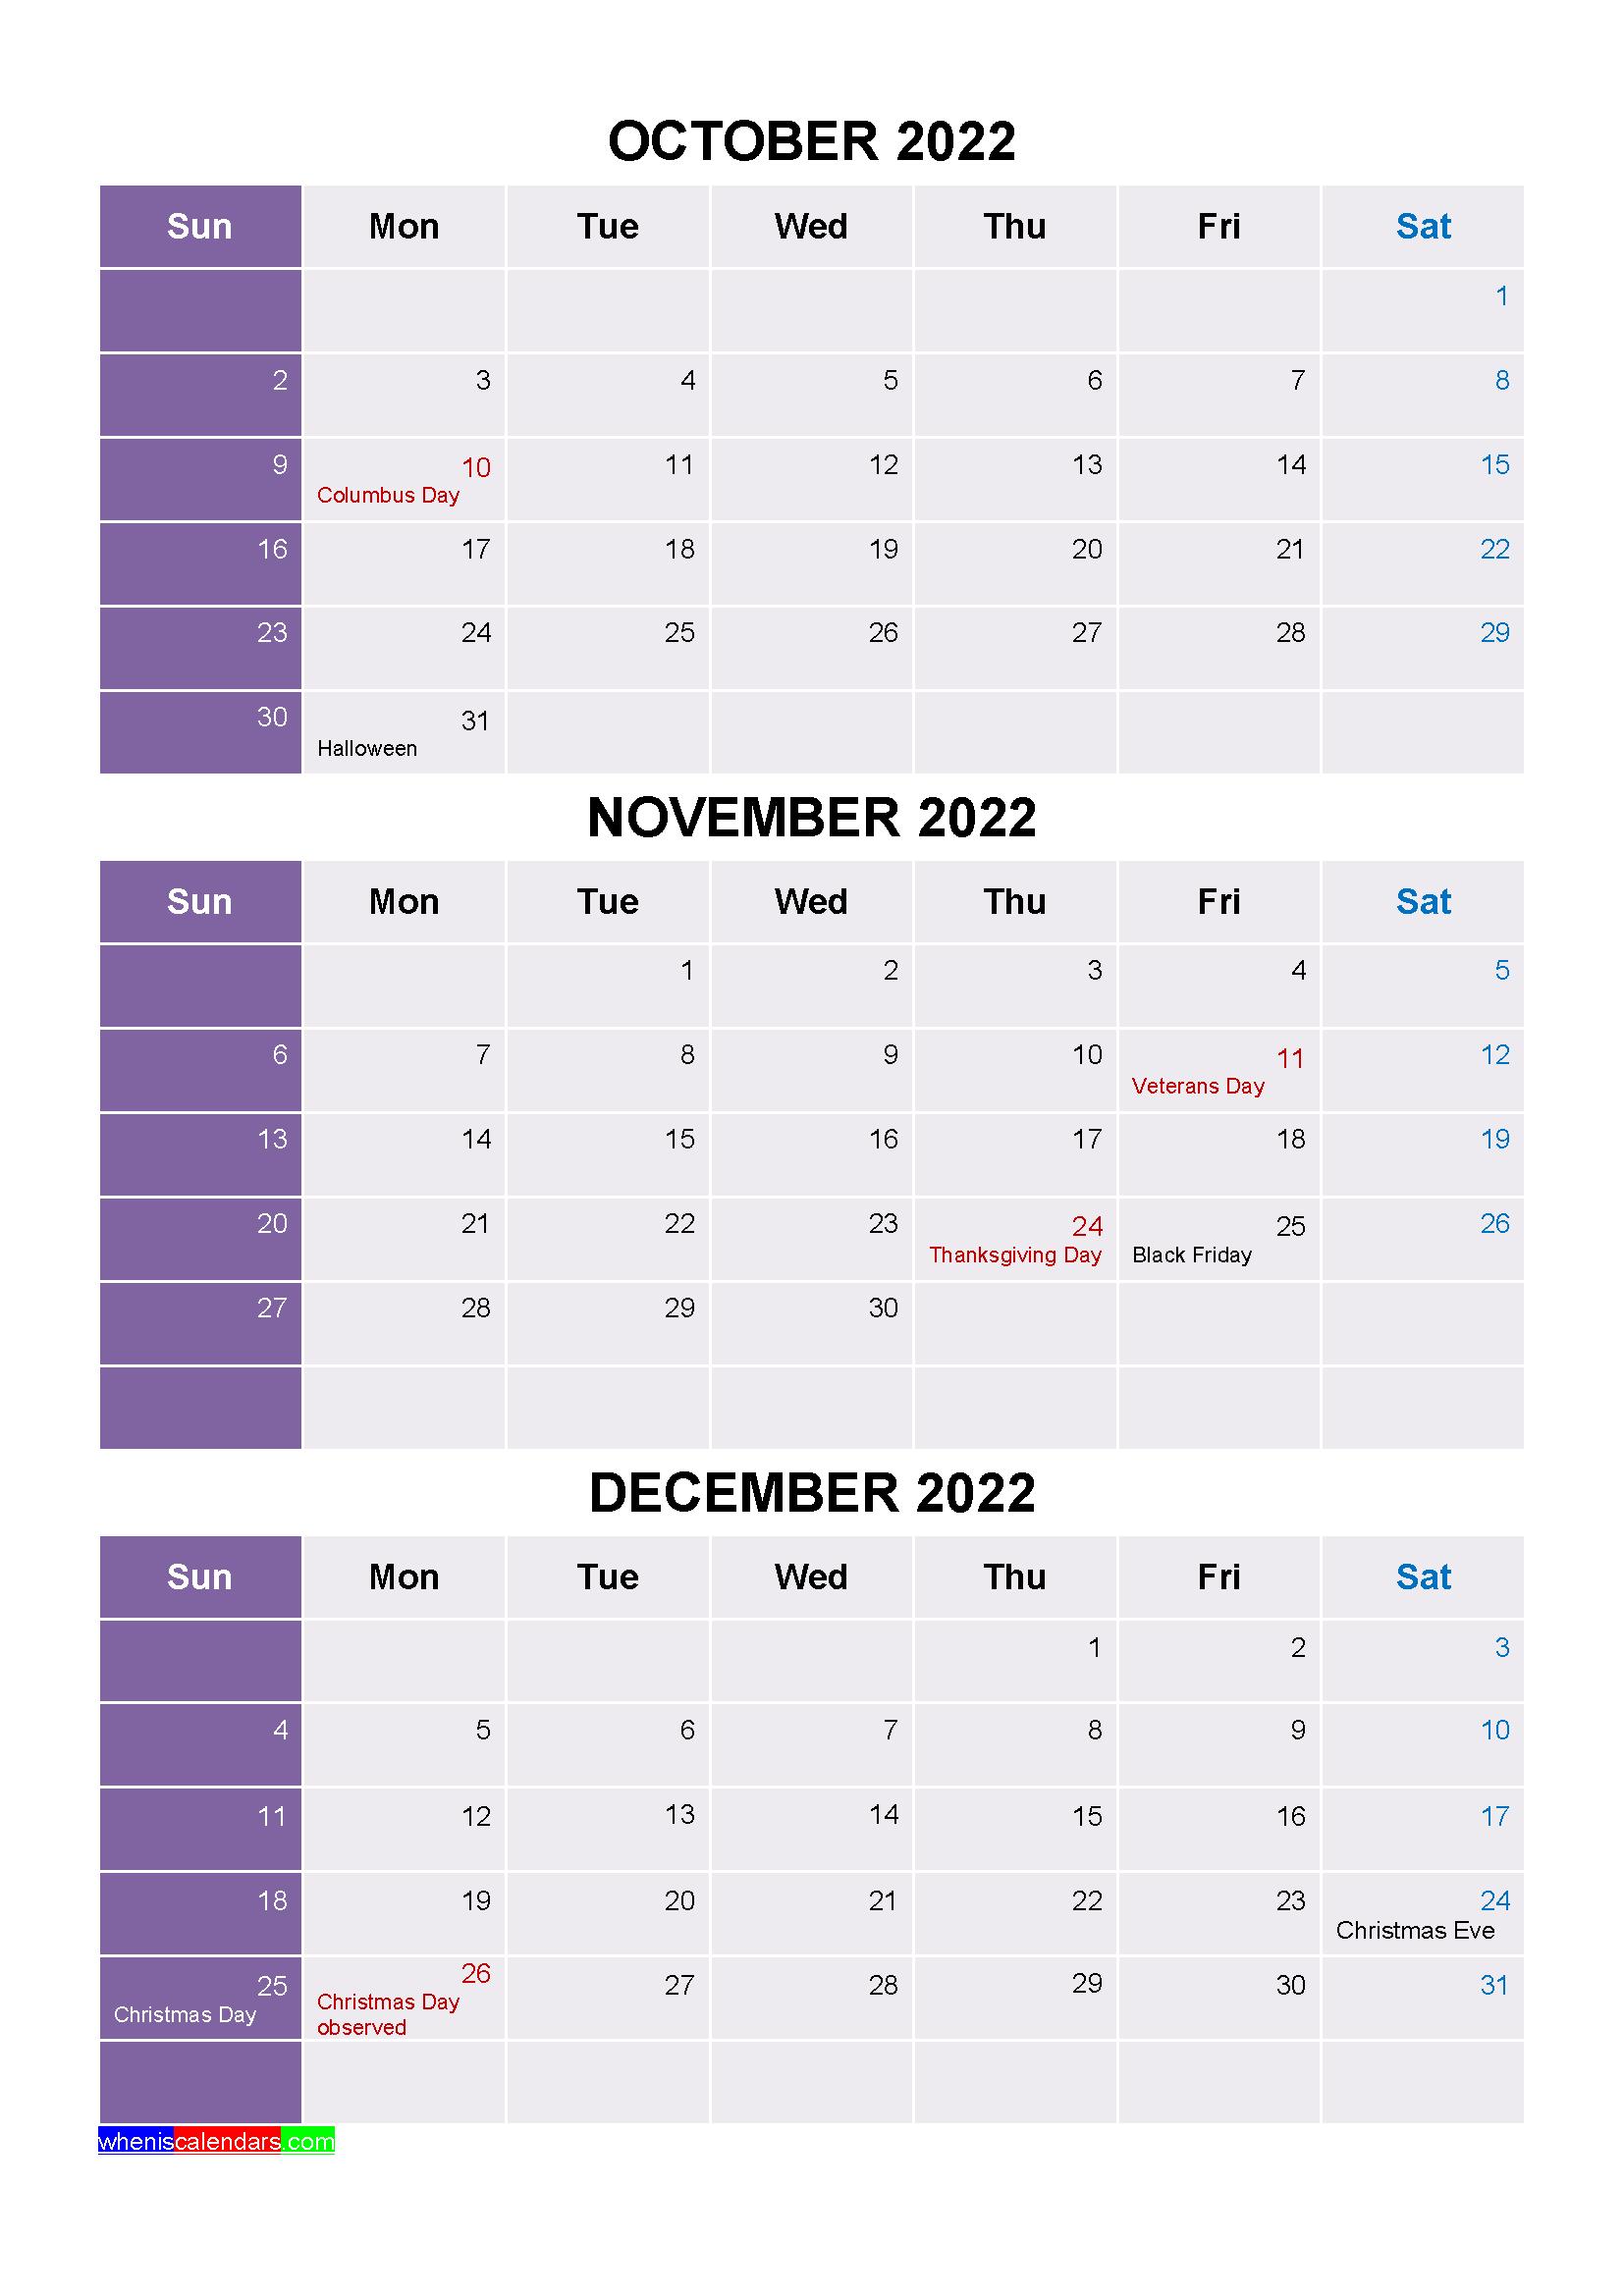 2022 Calendar October.Printable October November December 2022 Calendar With Holidays Four Quarters Printables Holiday Printables January February March